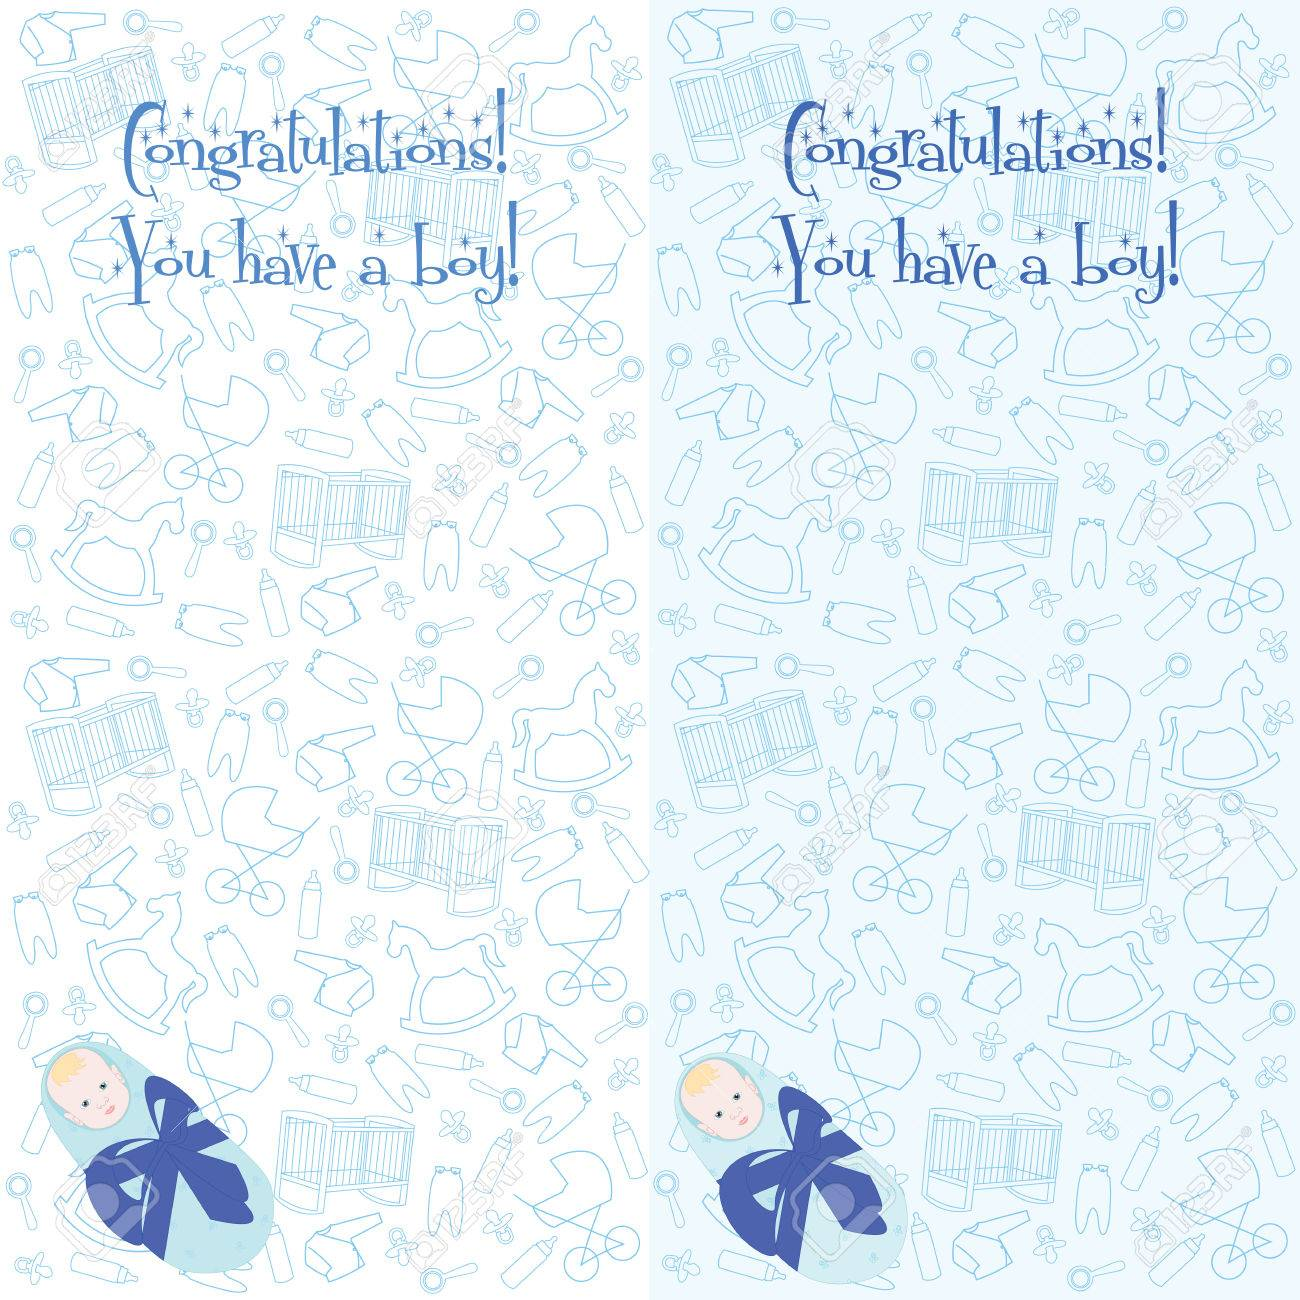 congratulations you have a boy little newborn baby boy baby in